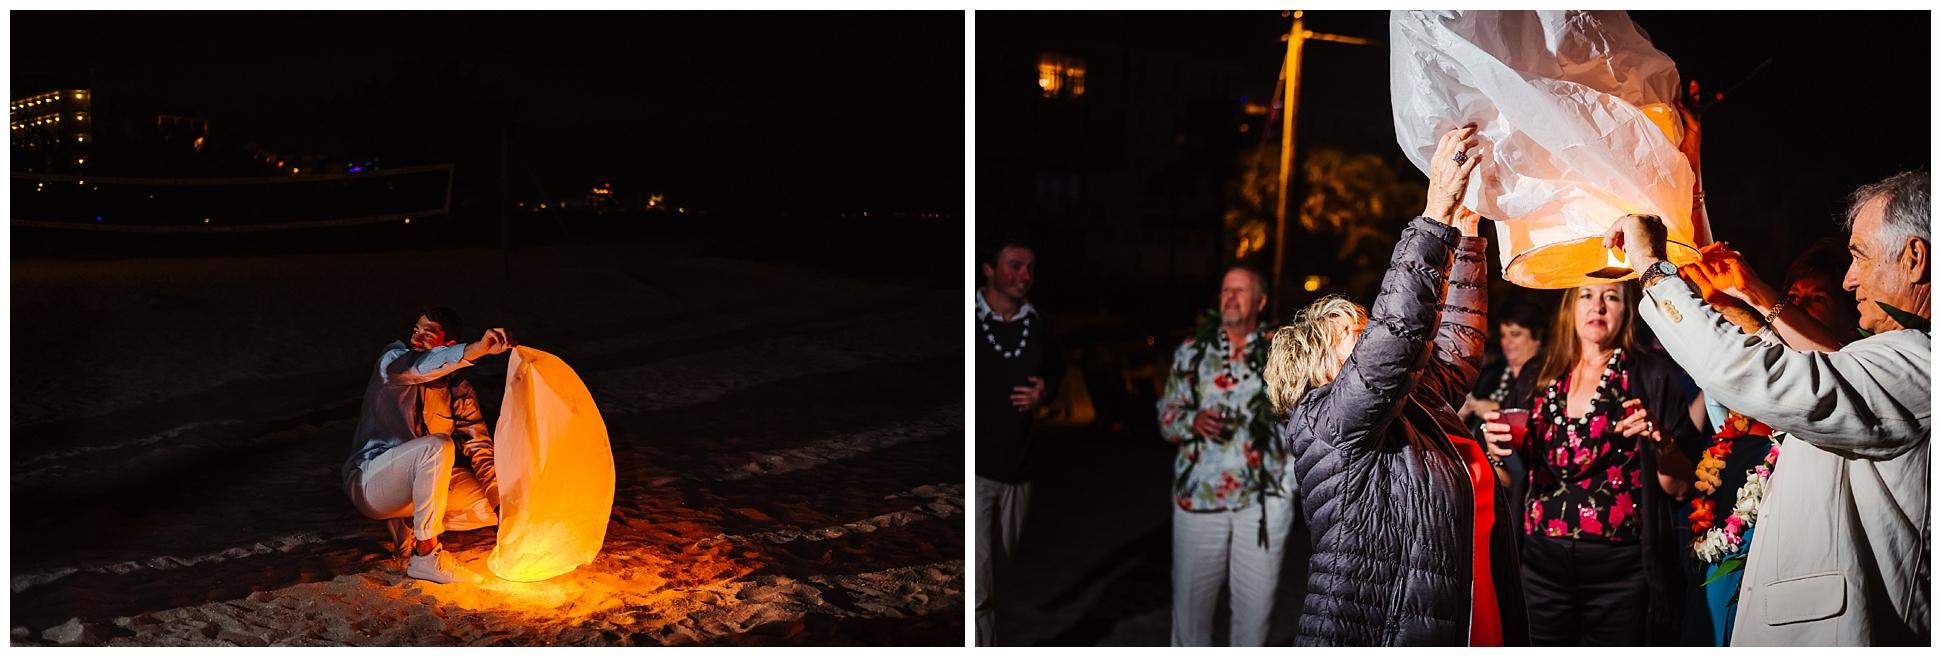 tampa-bay-wedding-photographer-barefoot-post-card-inn-tropical-hawaiin-lei-pink-pineapples-flower-crown_0209.jpg